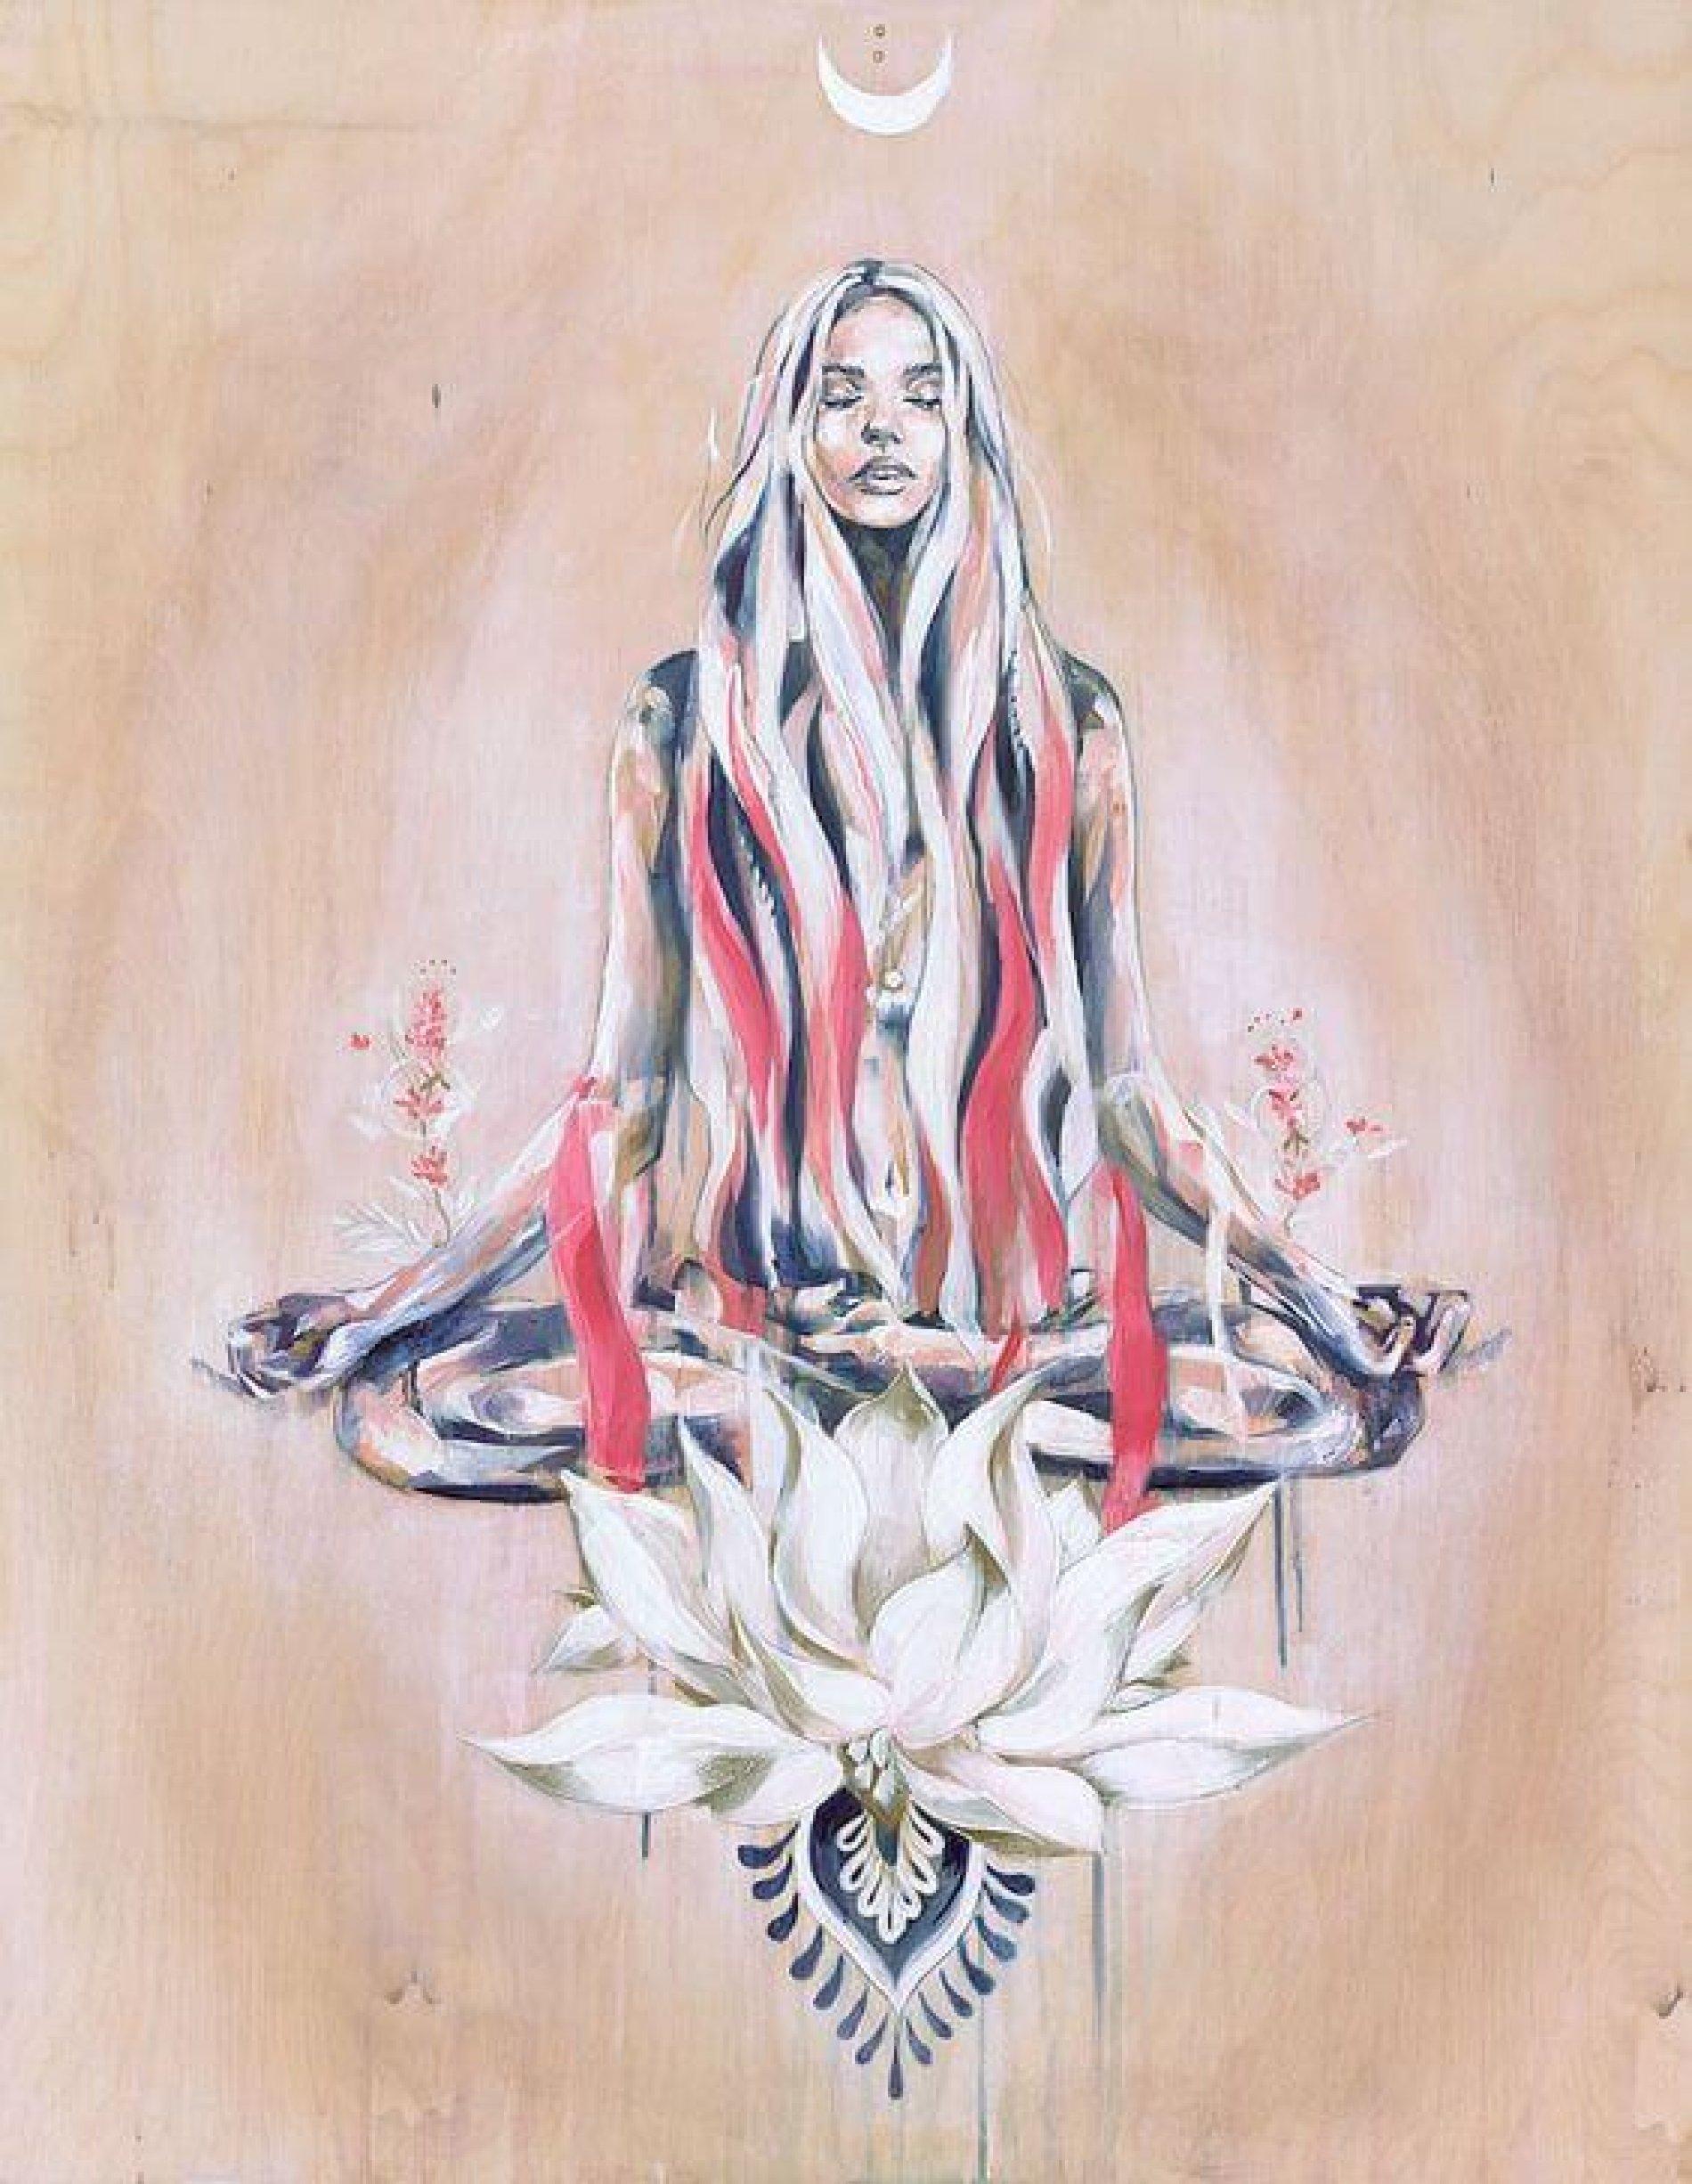 Electric Yoga voor de vagina